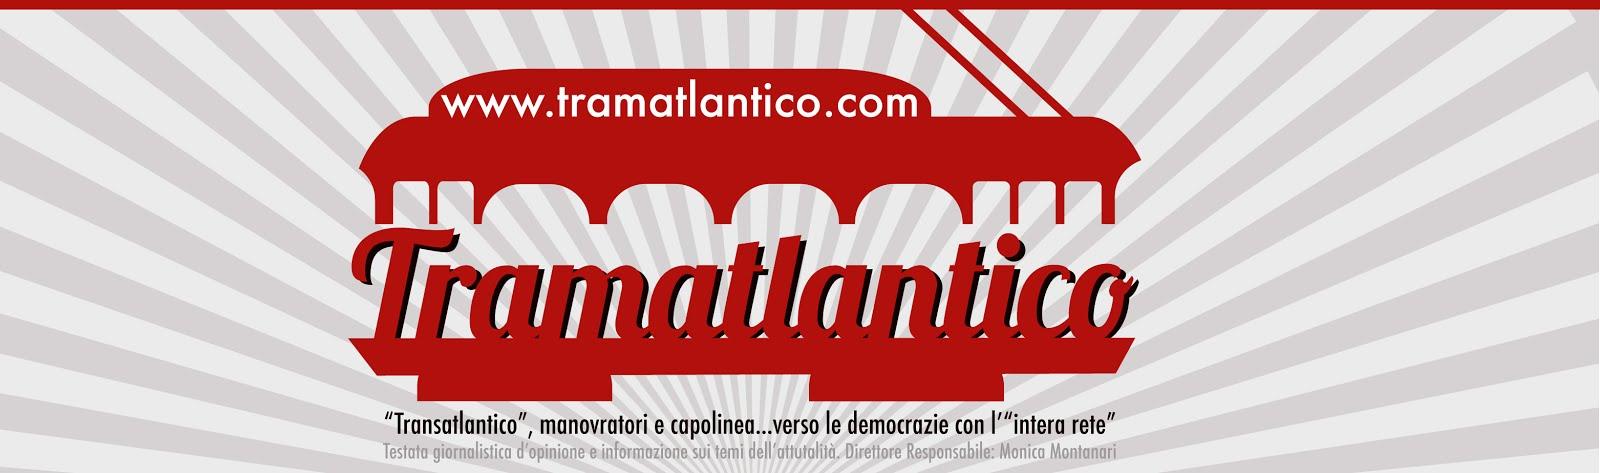 Tramatlantico